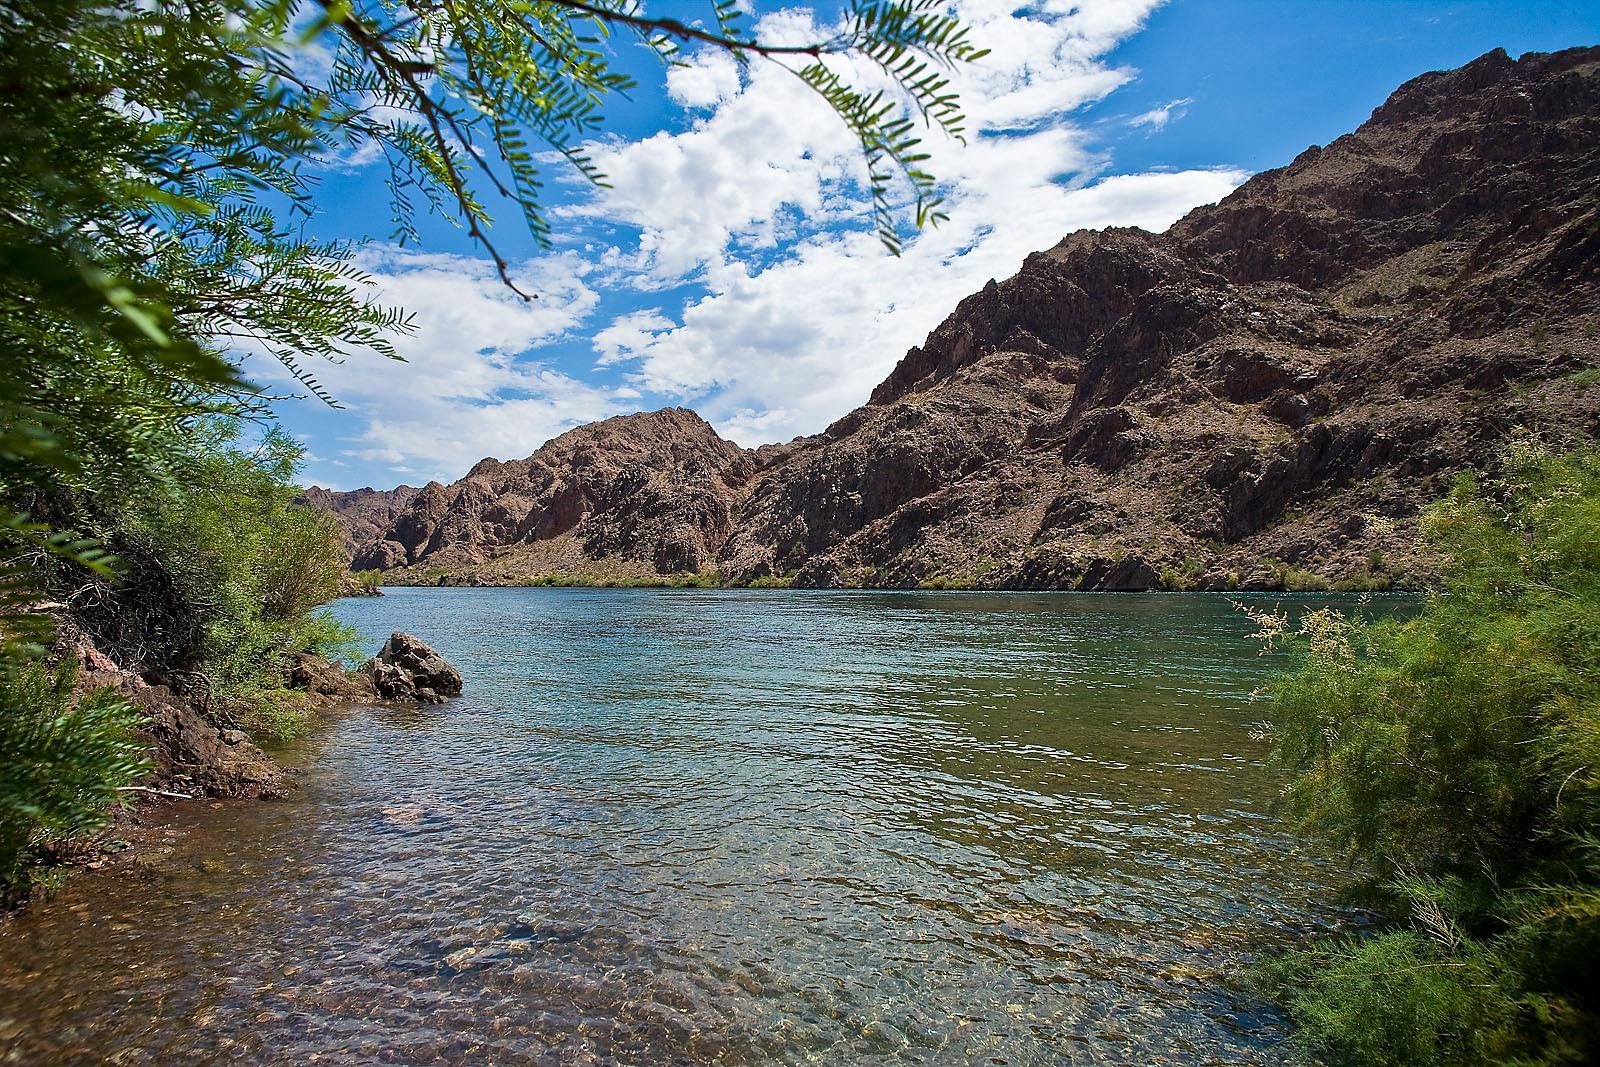 Nevada Scenic Landscape Vista  Q4G8485